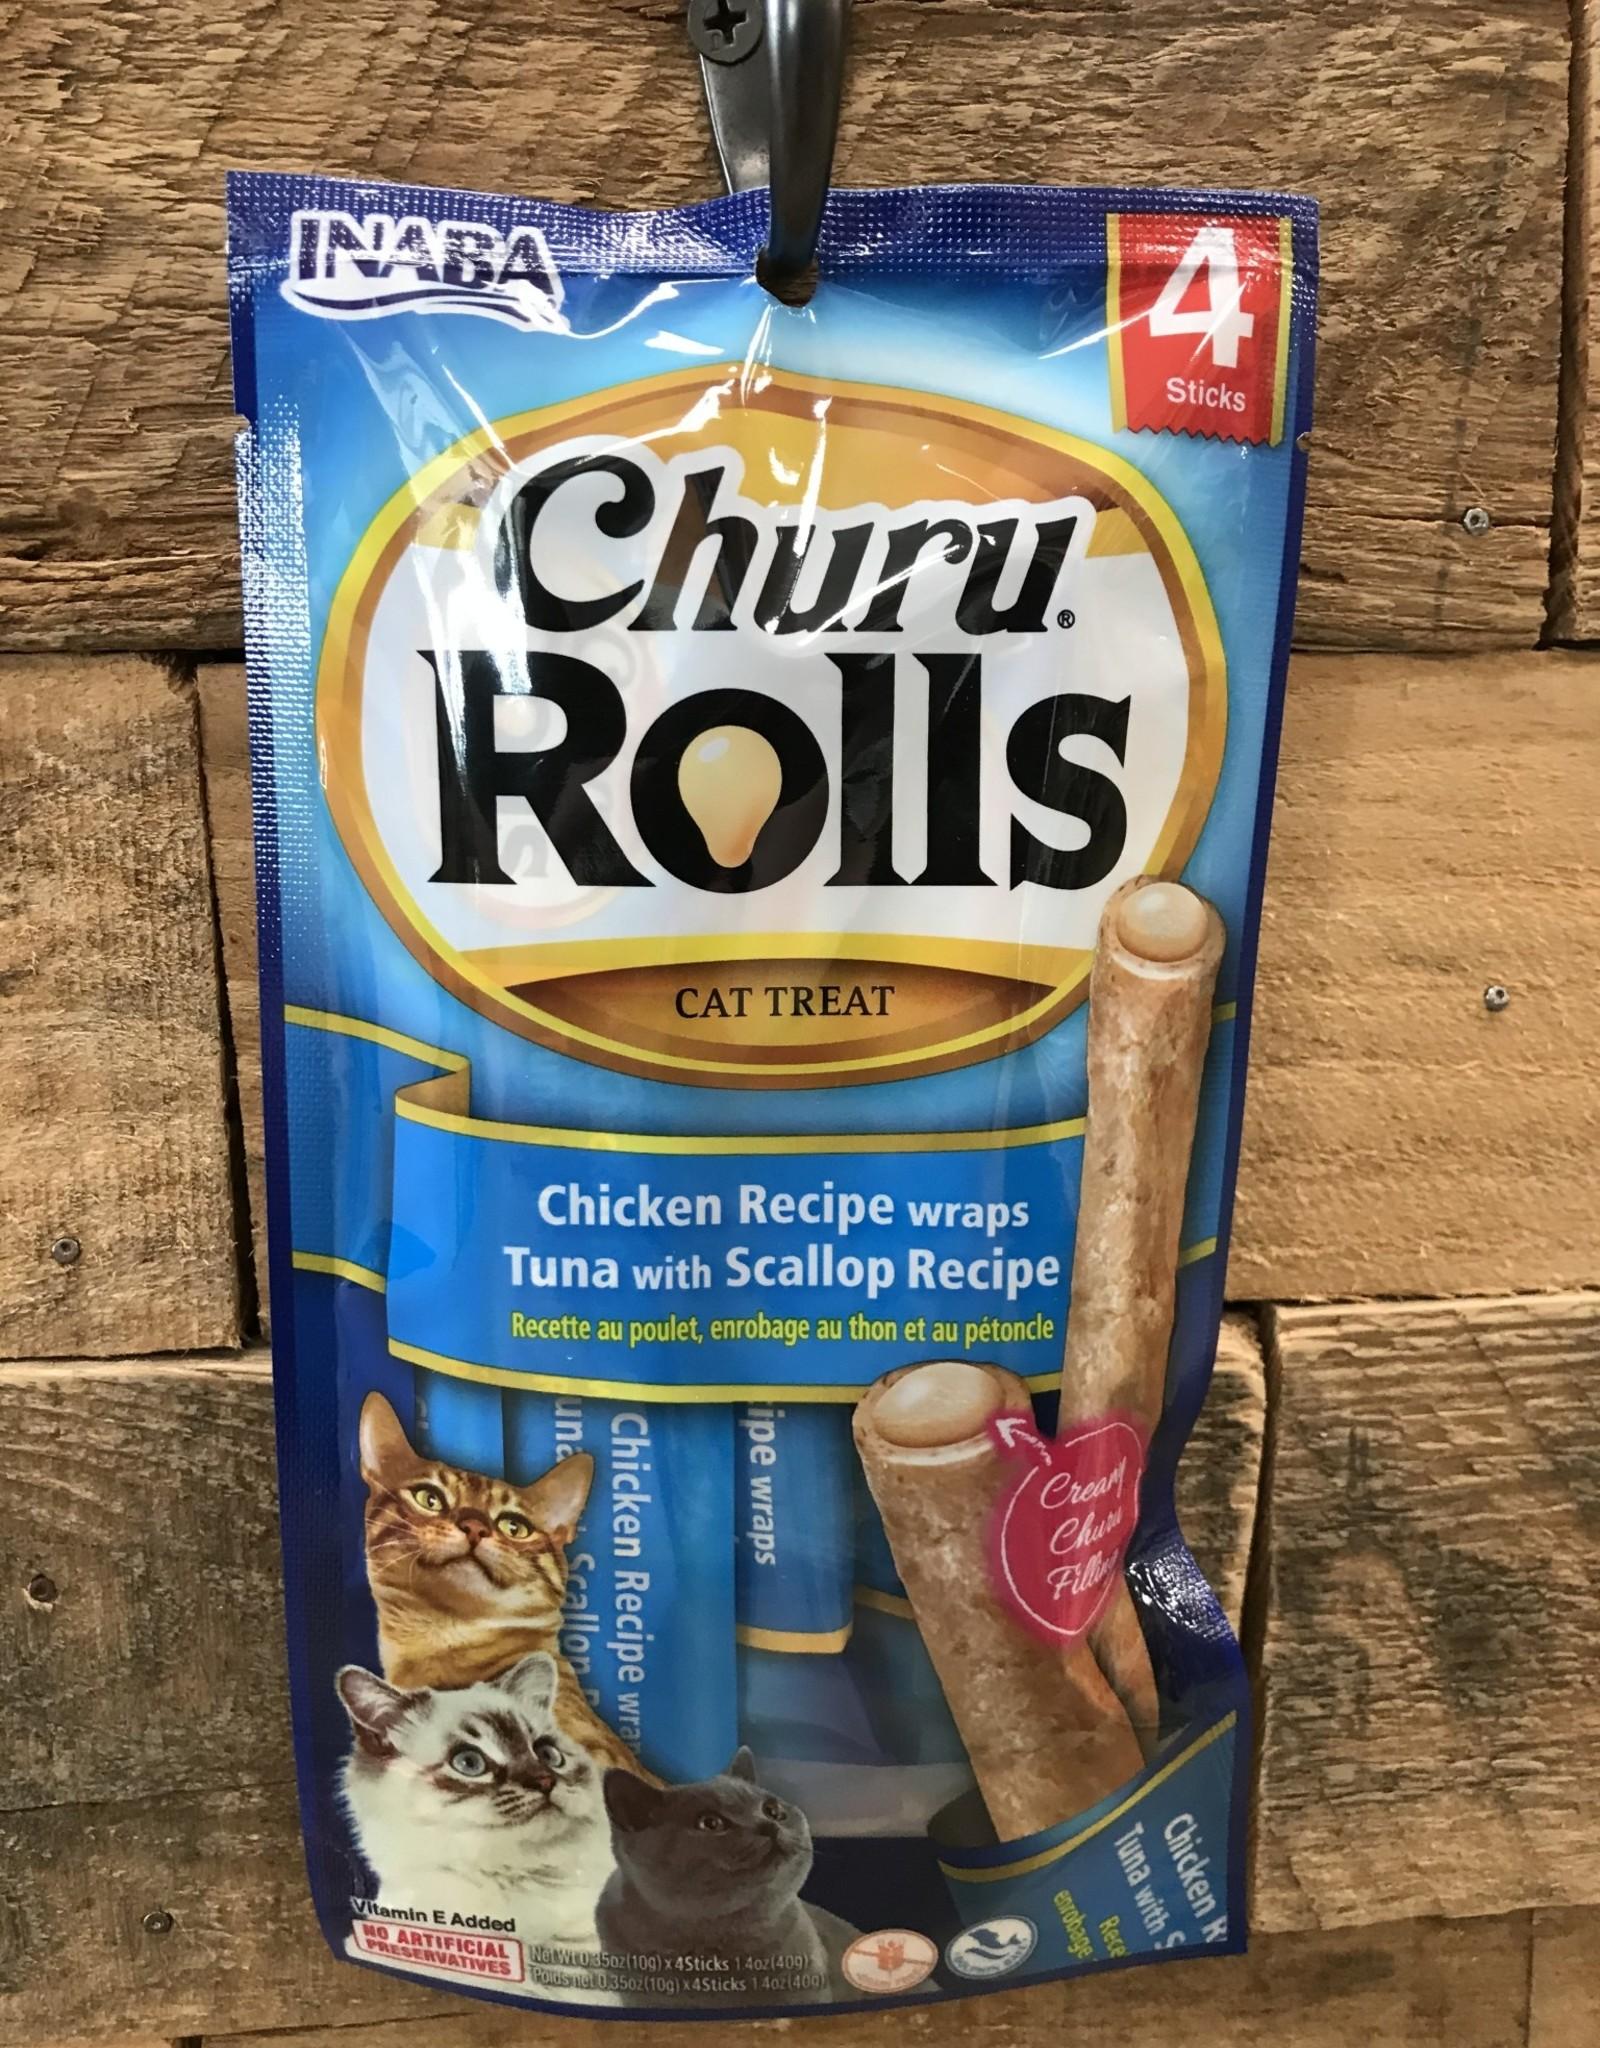 Inaba Ciao Inaba Churu Rolls Chicken Recipe wraps Tuna with Scallop Recipe 4/.35z tubes